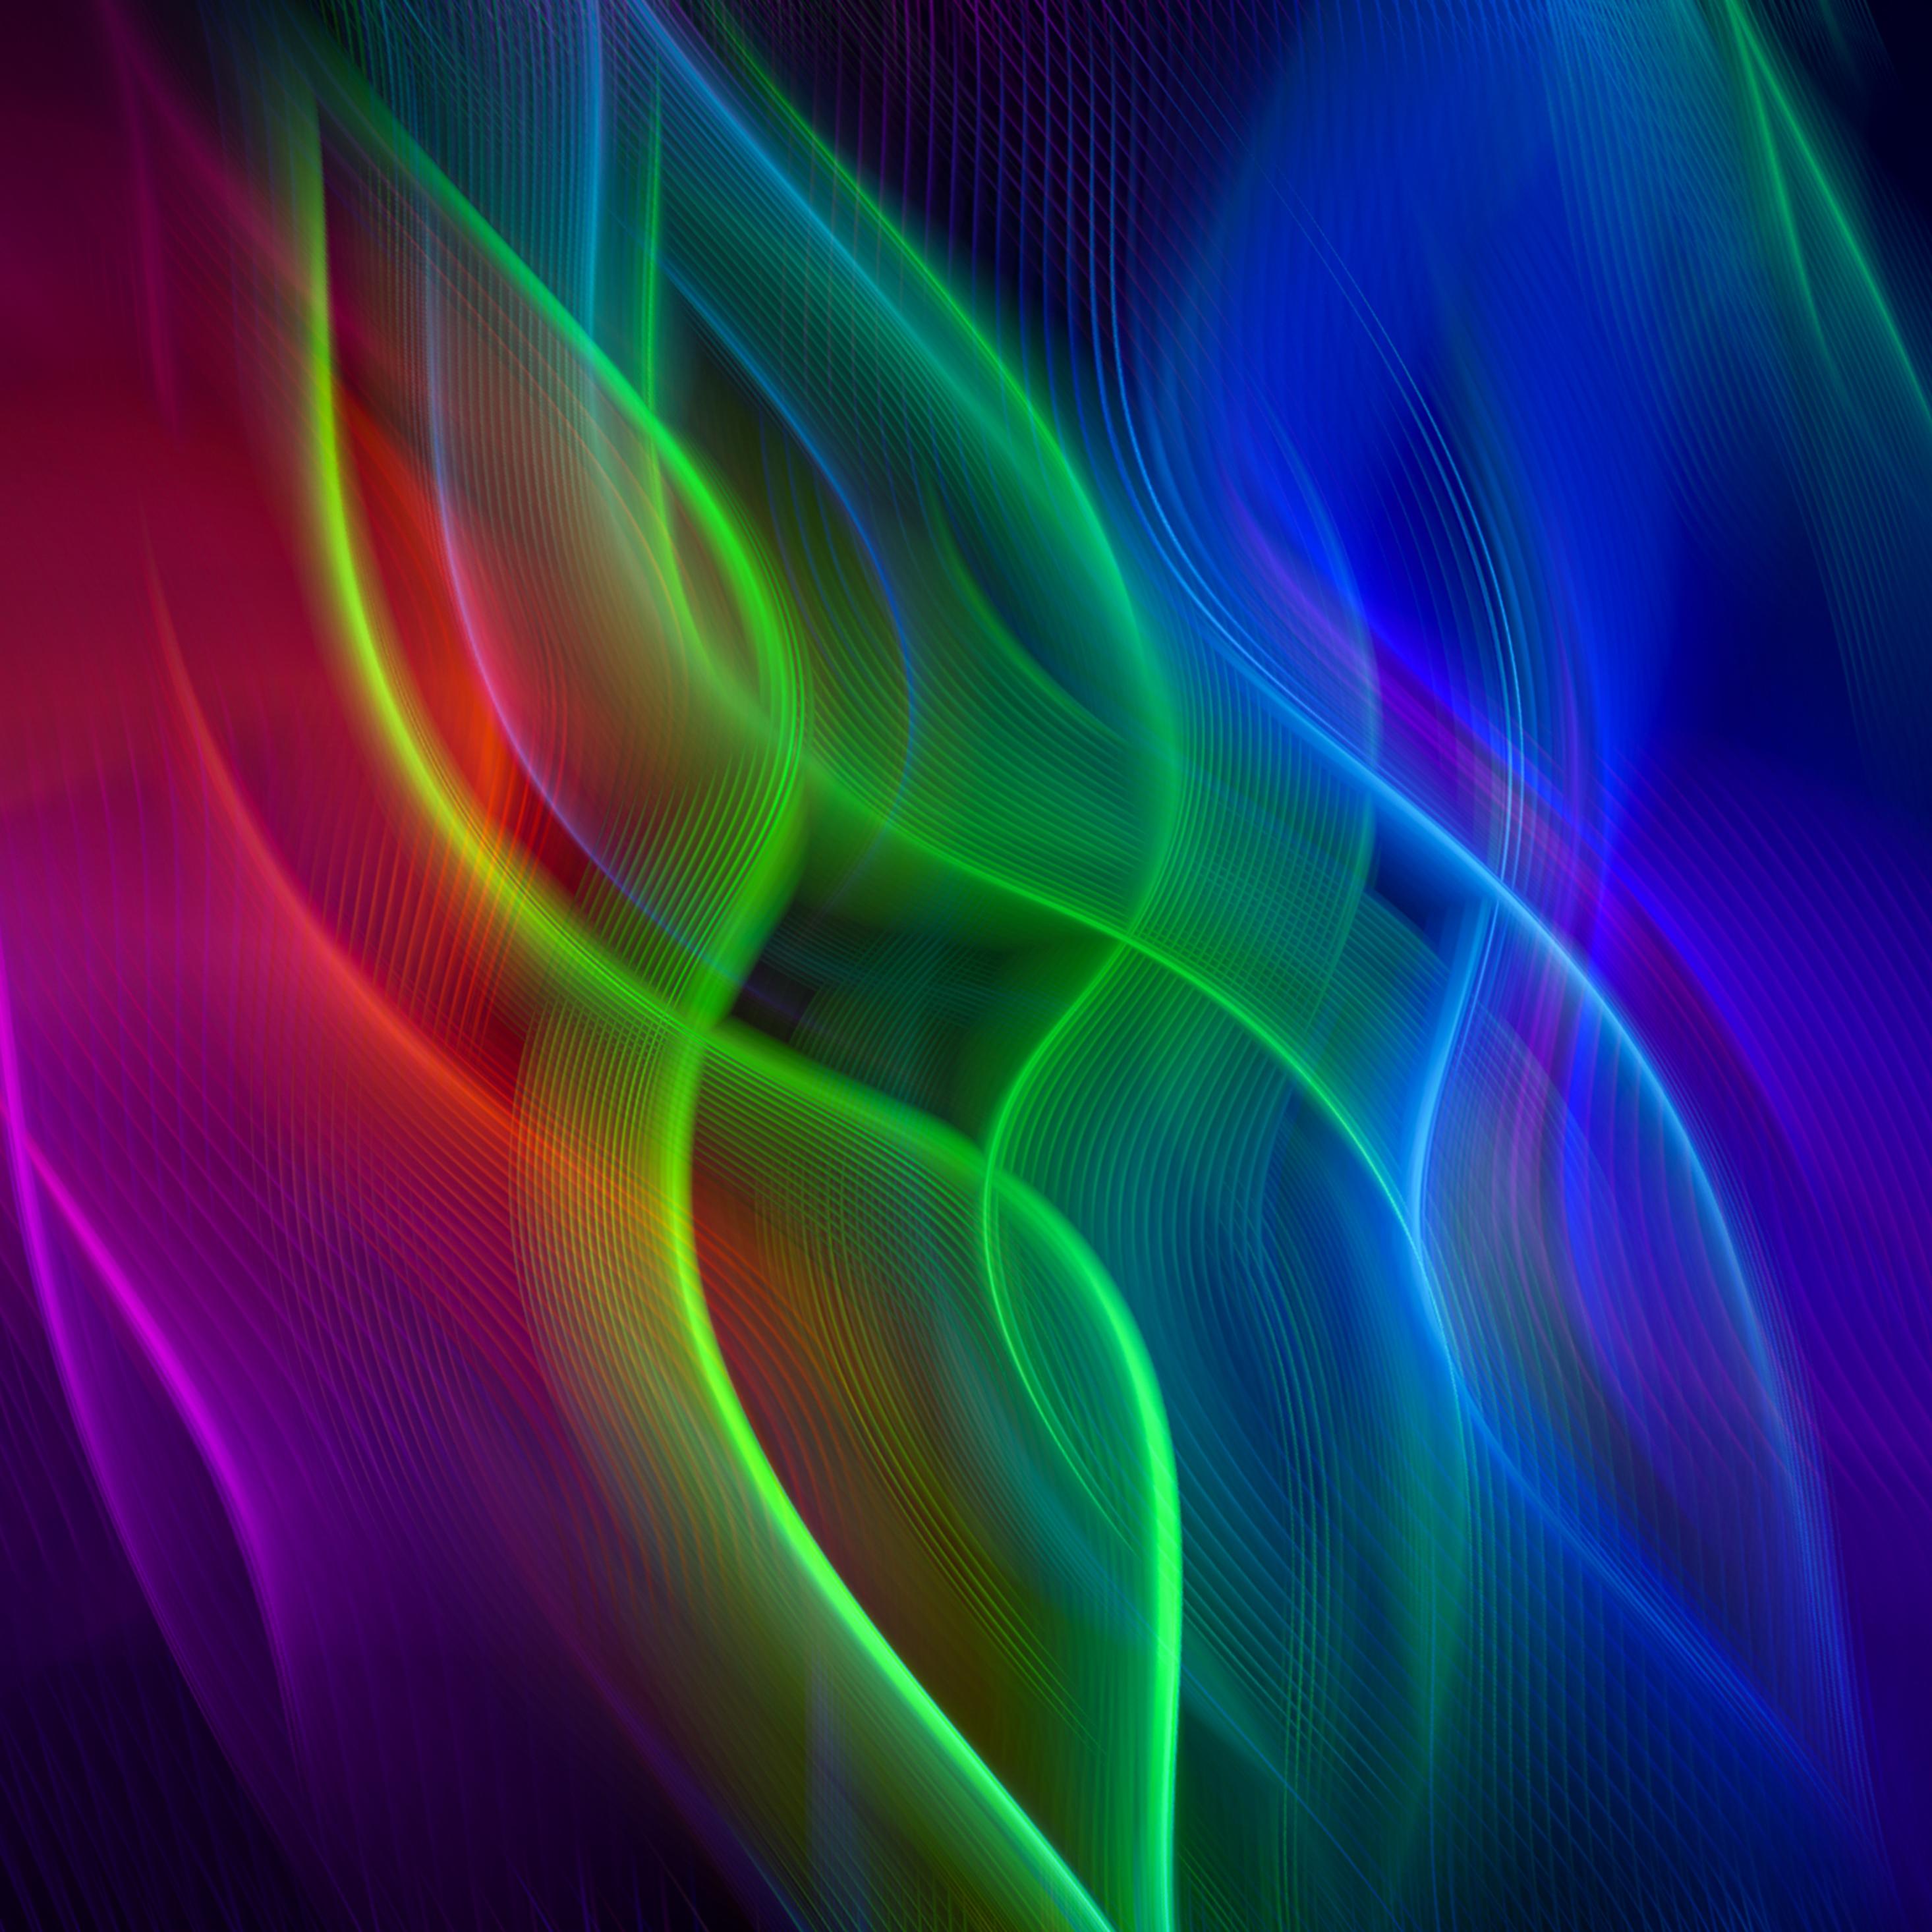 abstract-lines-flow-4k-yd.jpg